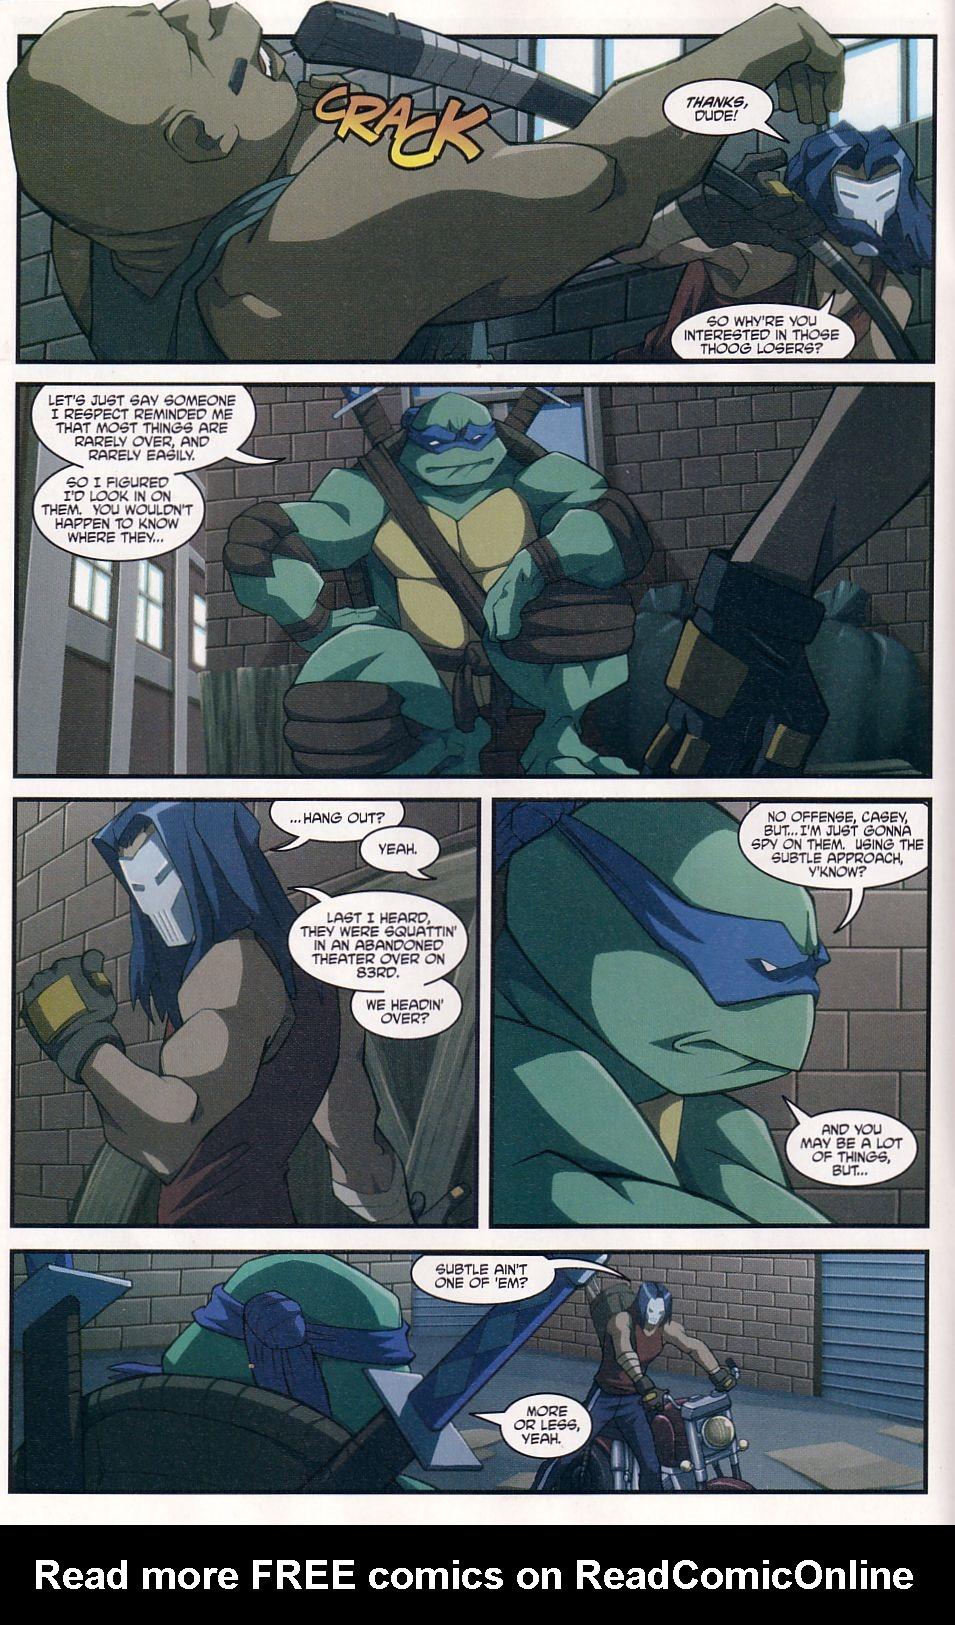 Teenage Mutant Ninja Turtles (2003) chap 7 pic 6